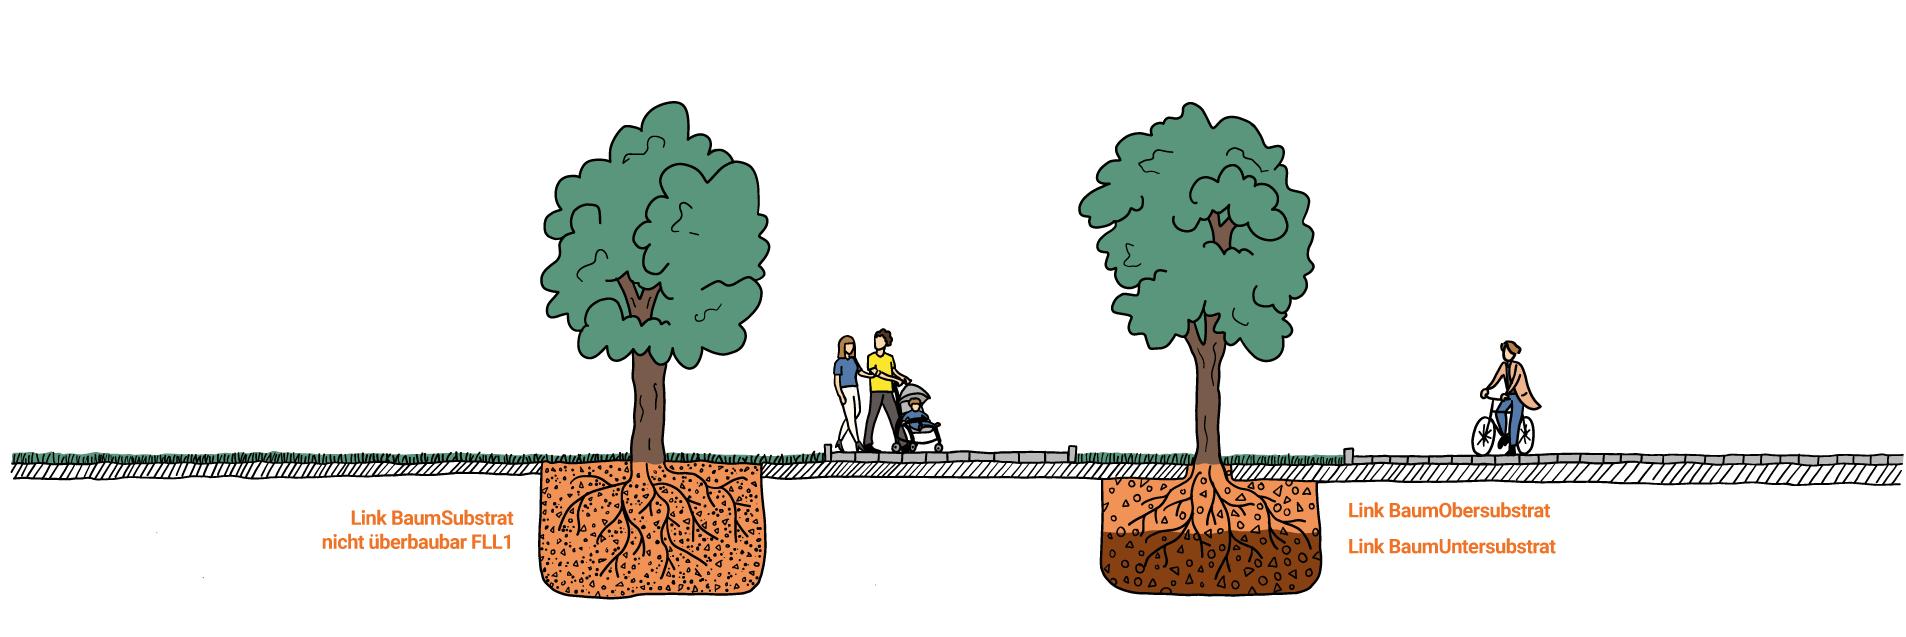 Grafik Vergleich Baumsubstrat Baumuntersubstrat